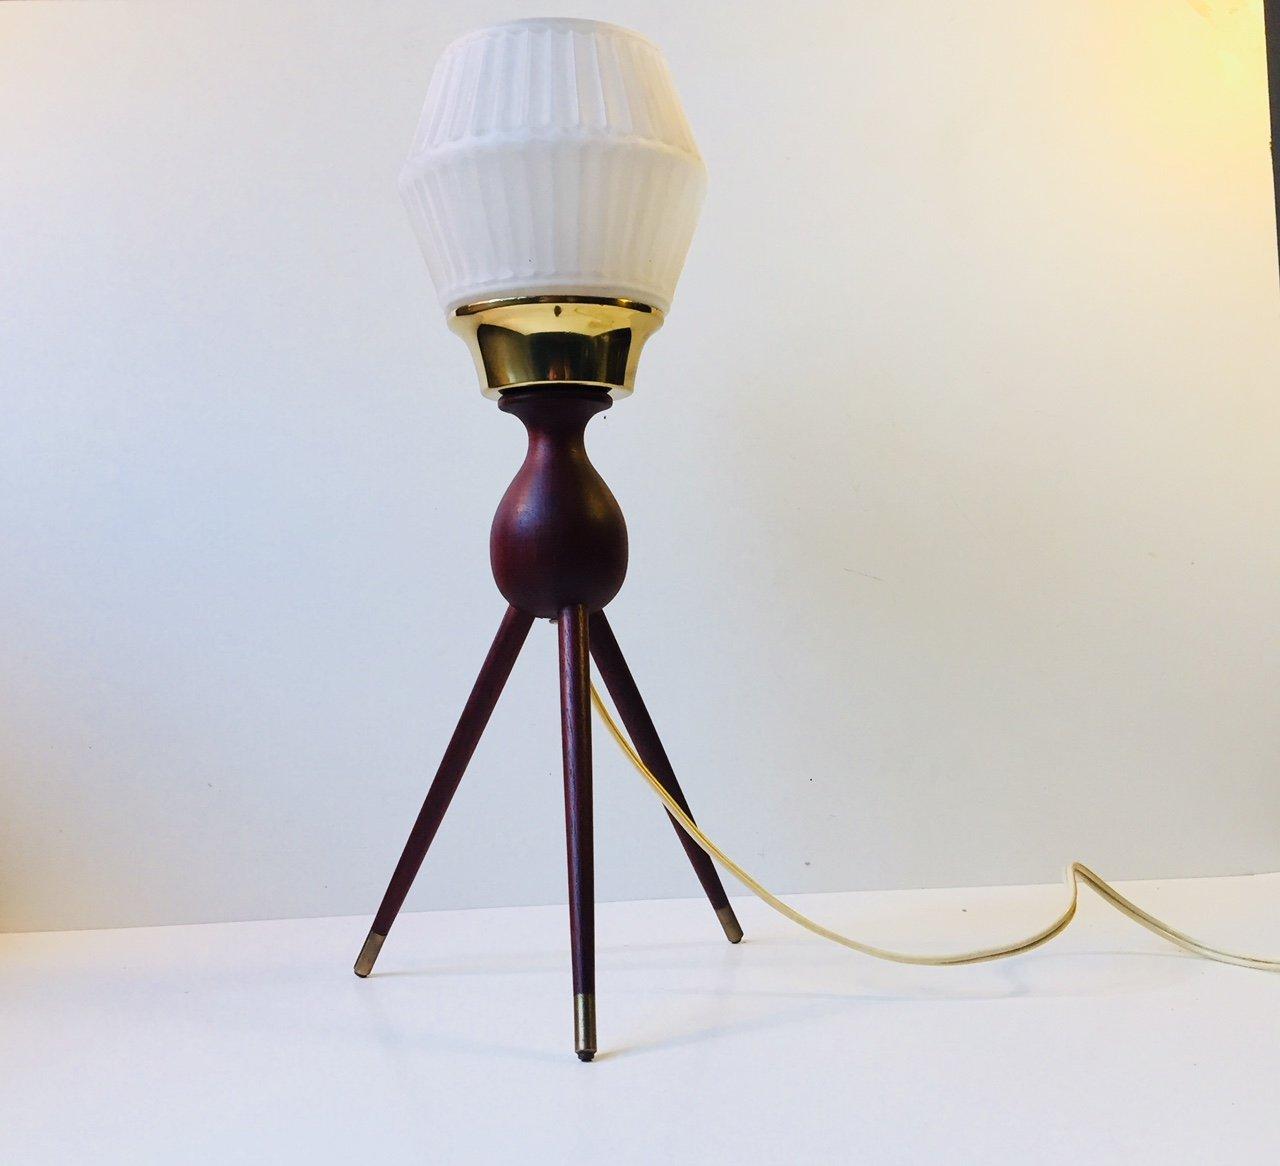 Mid century danish tripod table lamp in teak brass glass 1950s mid century danish tripod table lamp in teak brass glass 1950s aloadofball Image collections